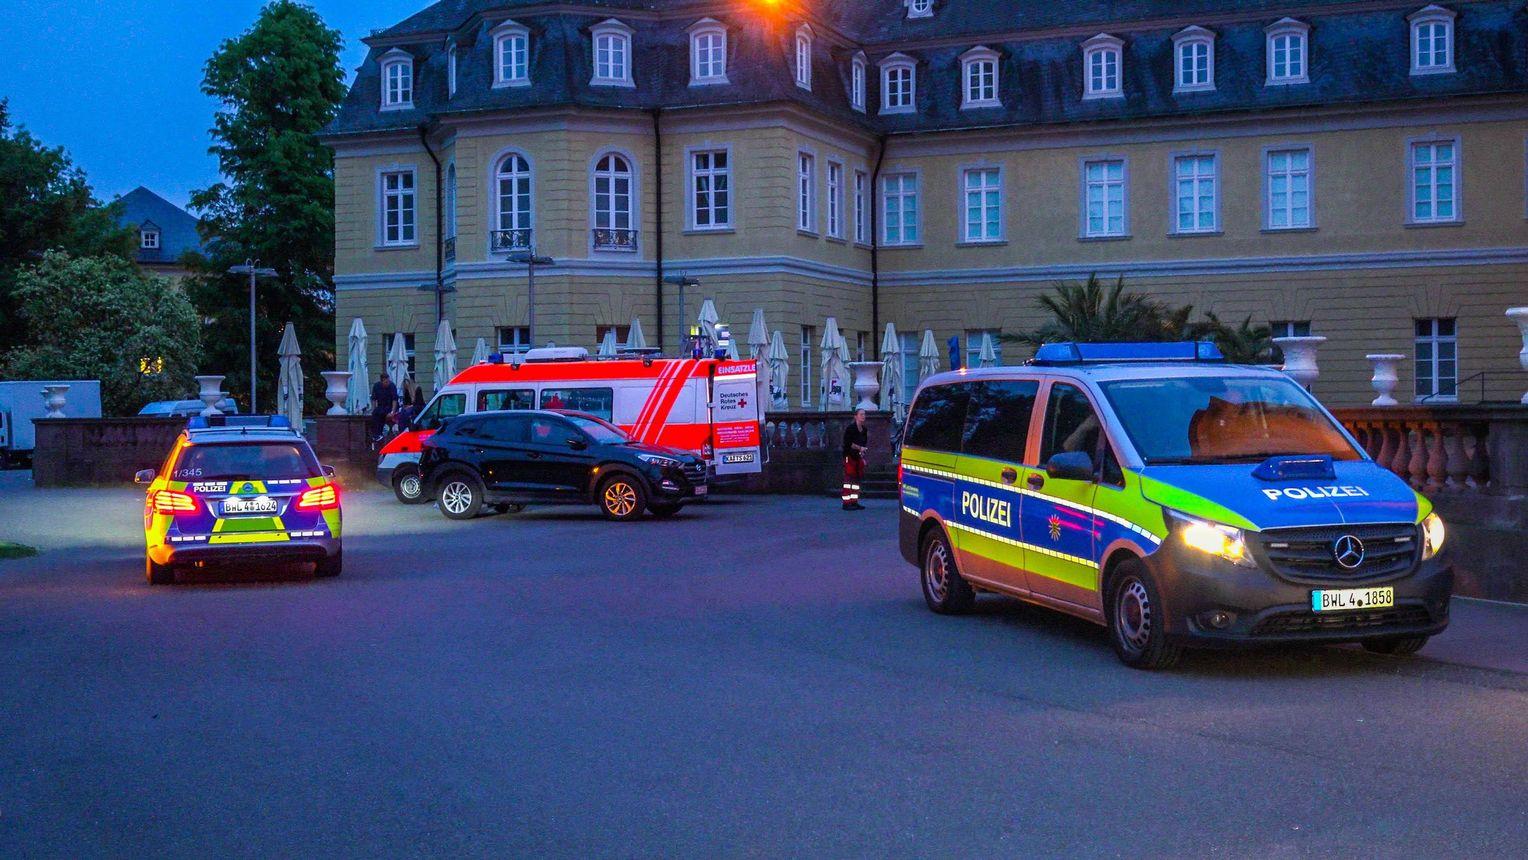 Polizei Karlsruhe Facebook